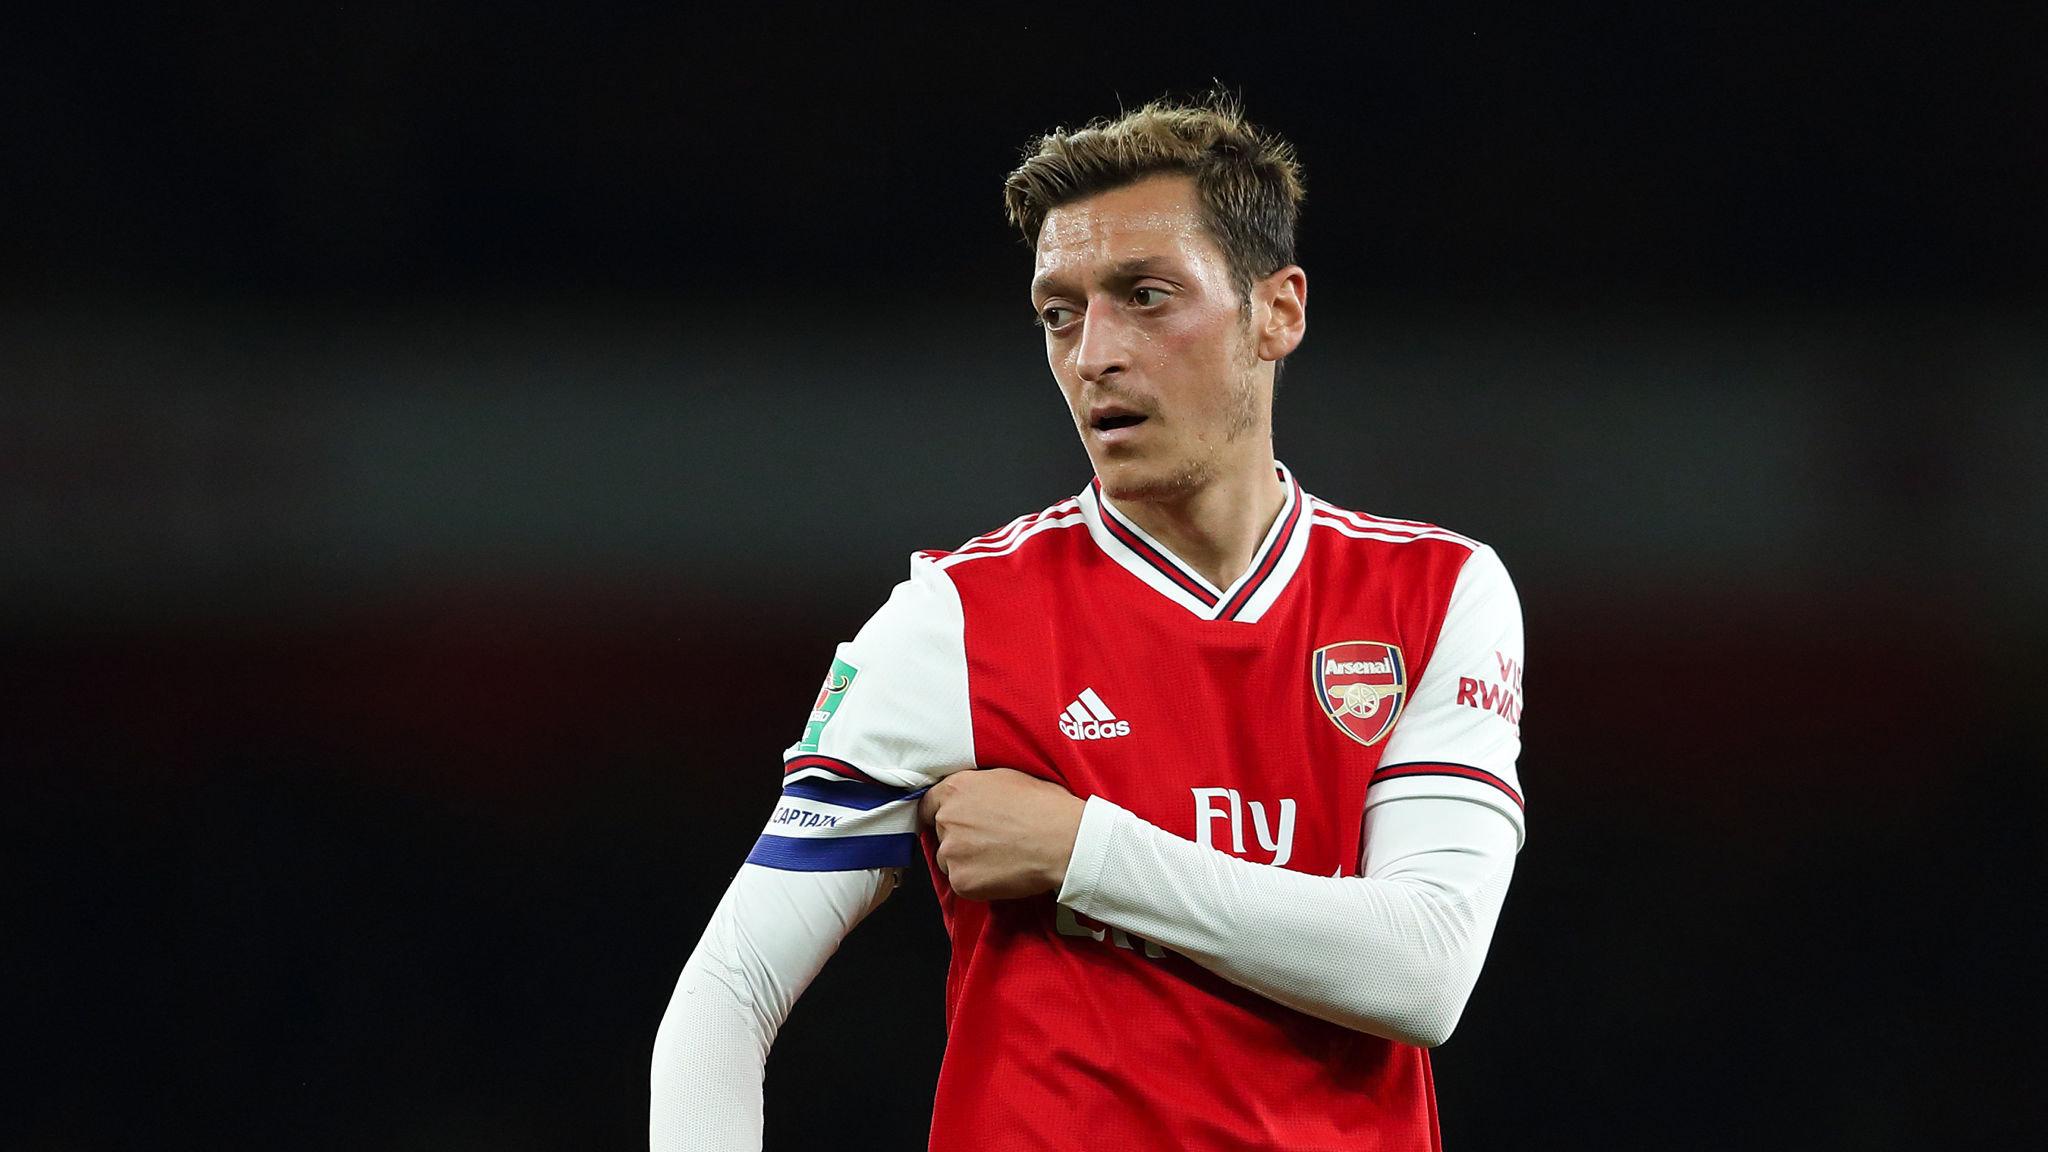 Mesut Özil and the death of the maverick